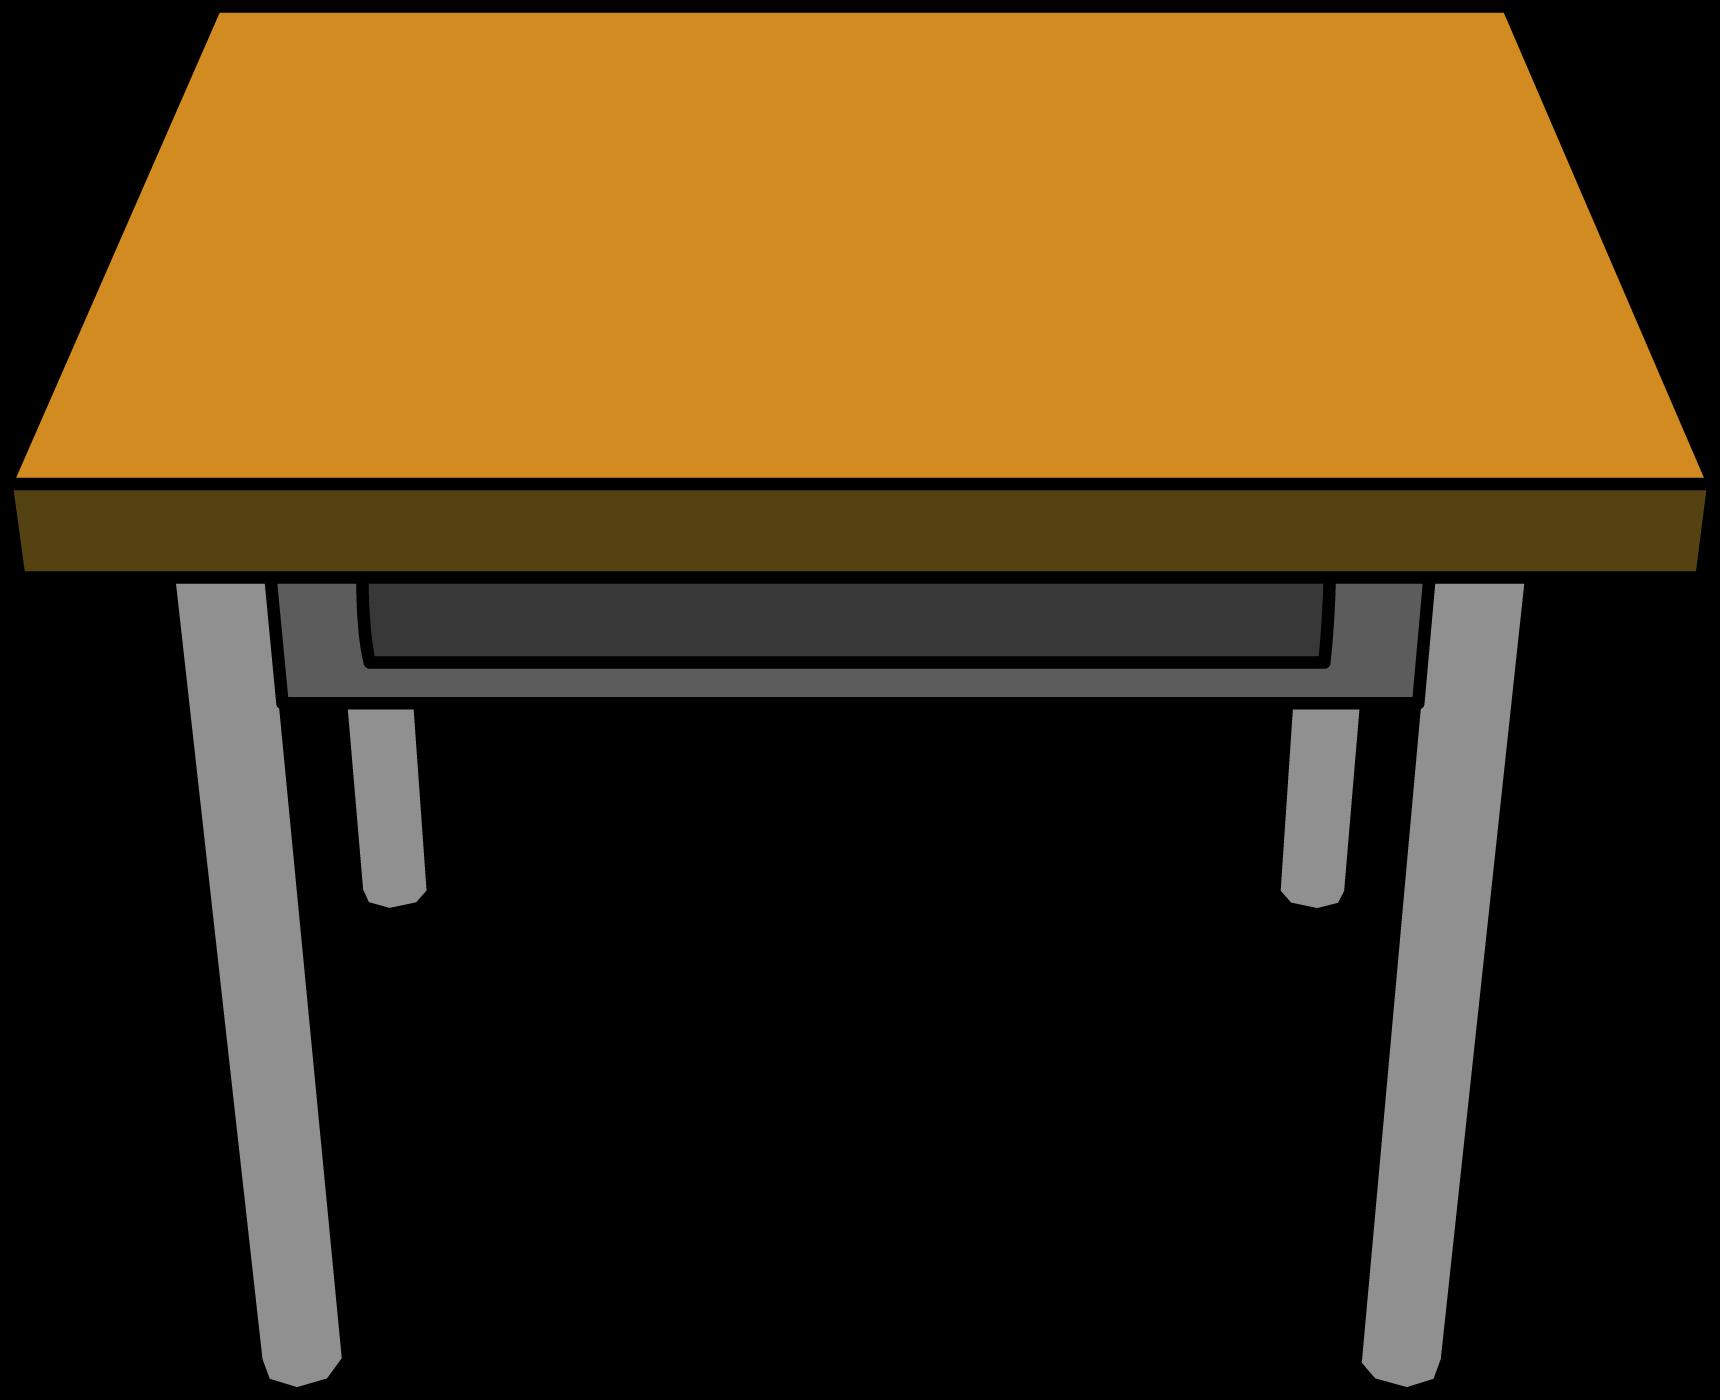 Classroom Desk Clipart - School Desk Clipart